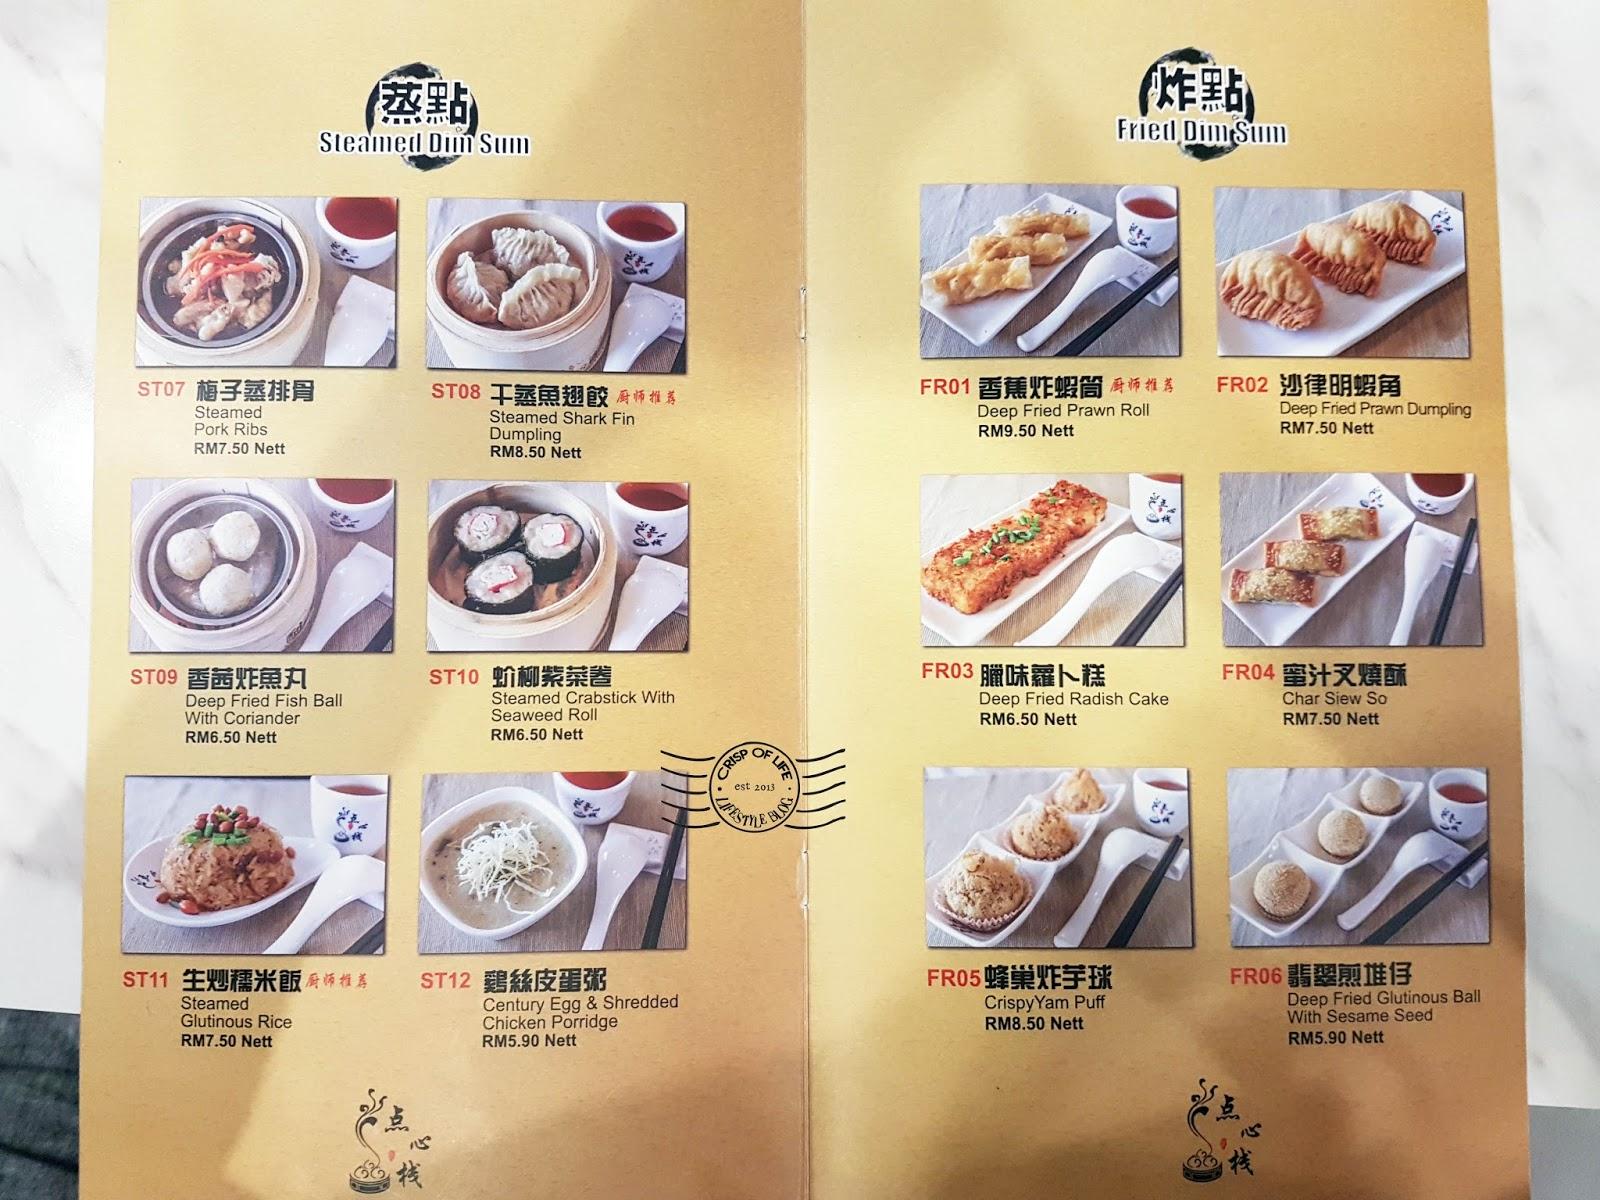 Dim Sum Station 点心栈港式点心餐厅 @ Promenade, Bayan Lepas, Penang